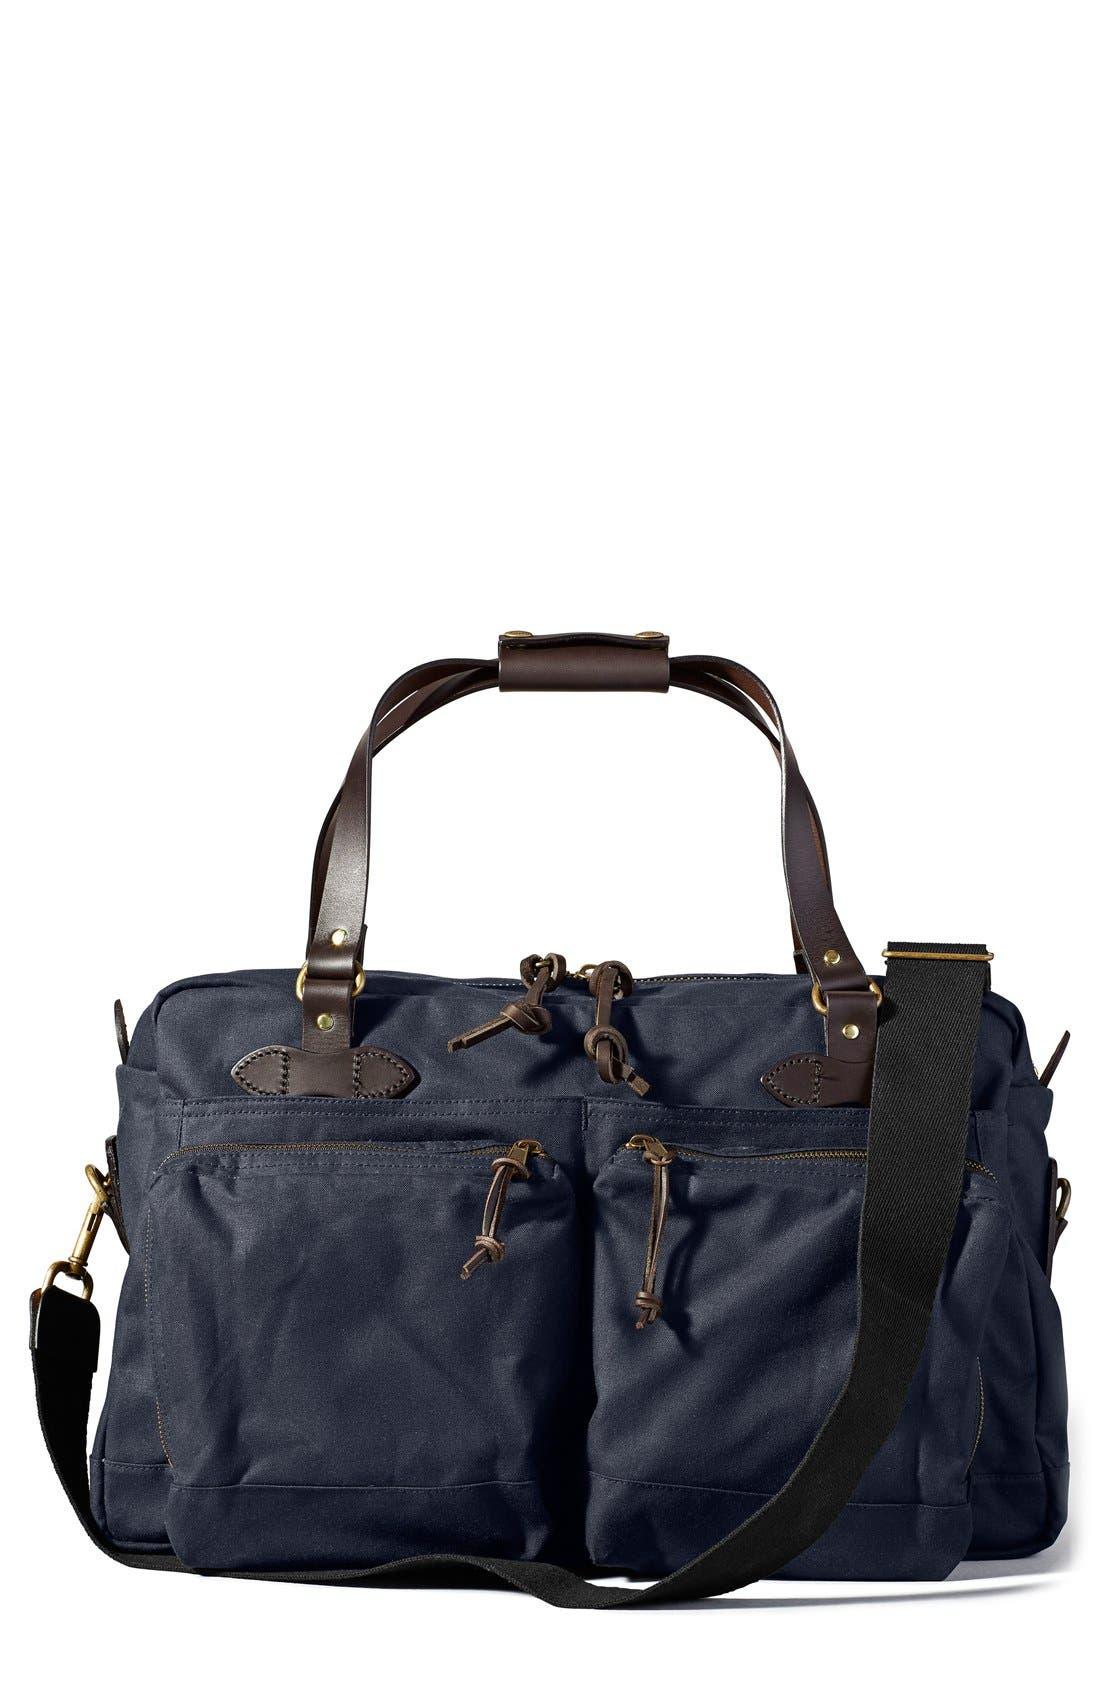 '48-Hour' Duffel Bag,                             Main thumbnail 1, color,                             NAVY